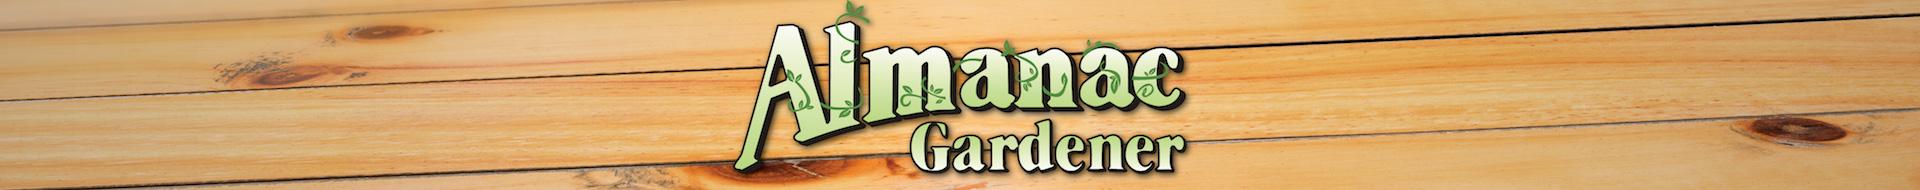 Almanac Gardner Logo Banner